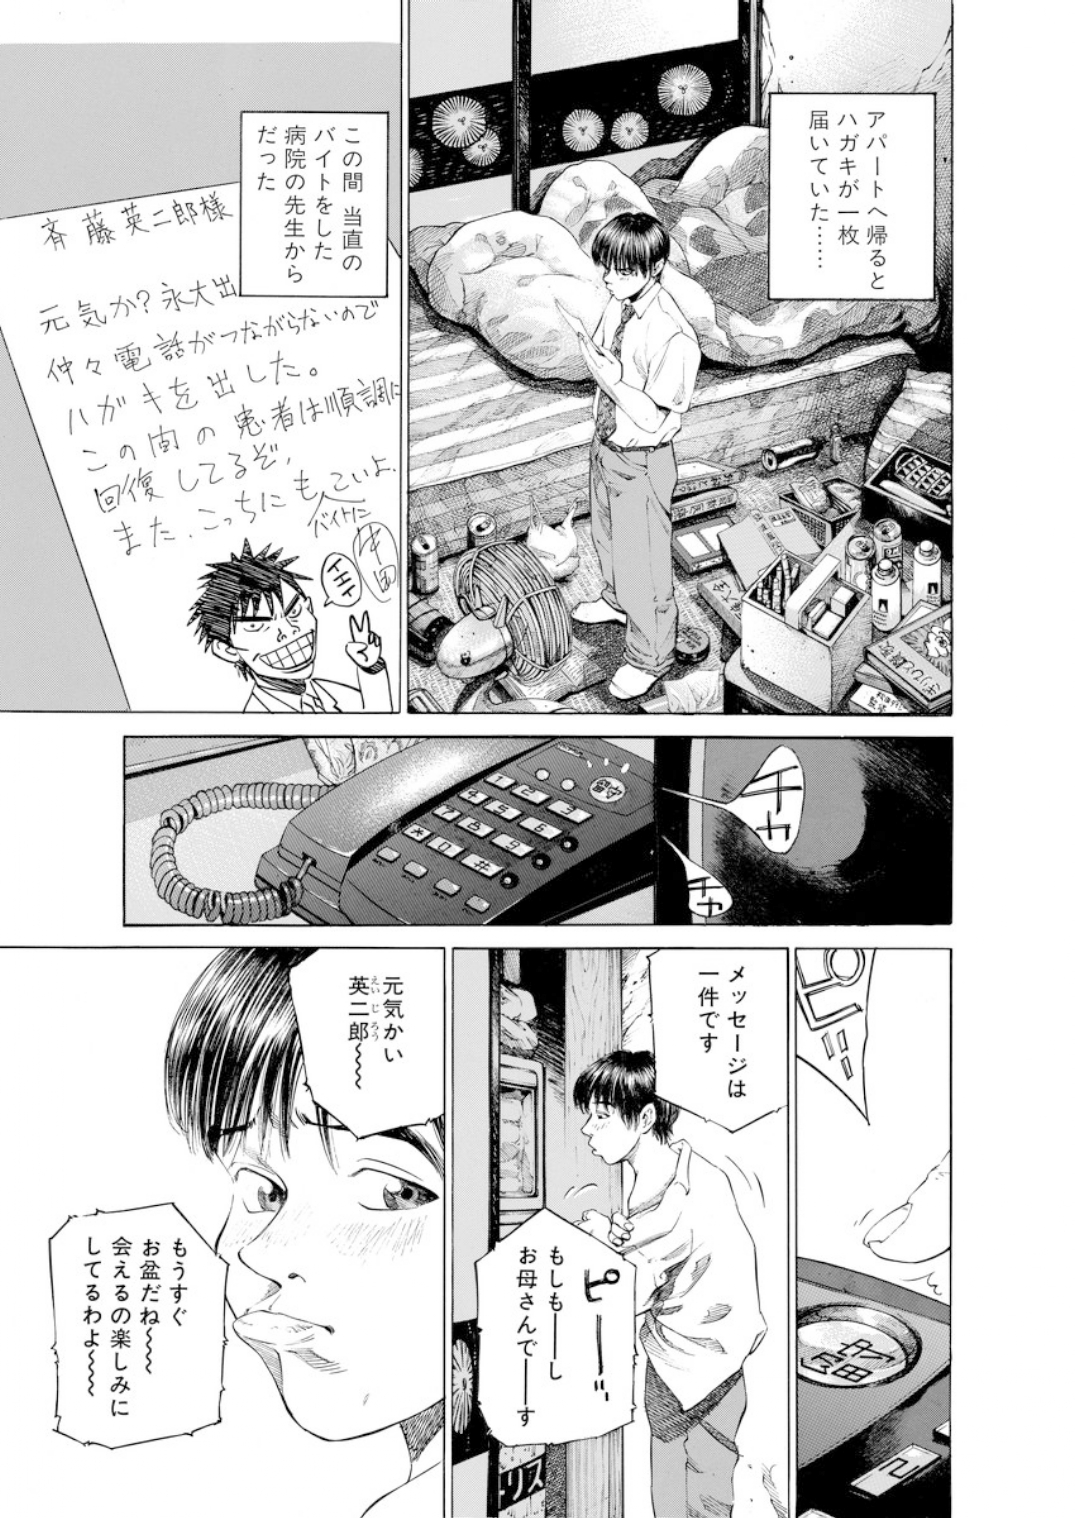 001bj_page-0097.jpg